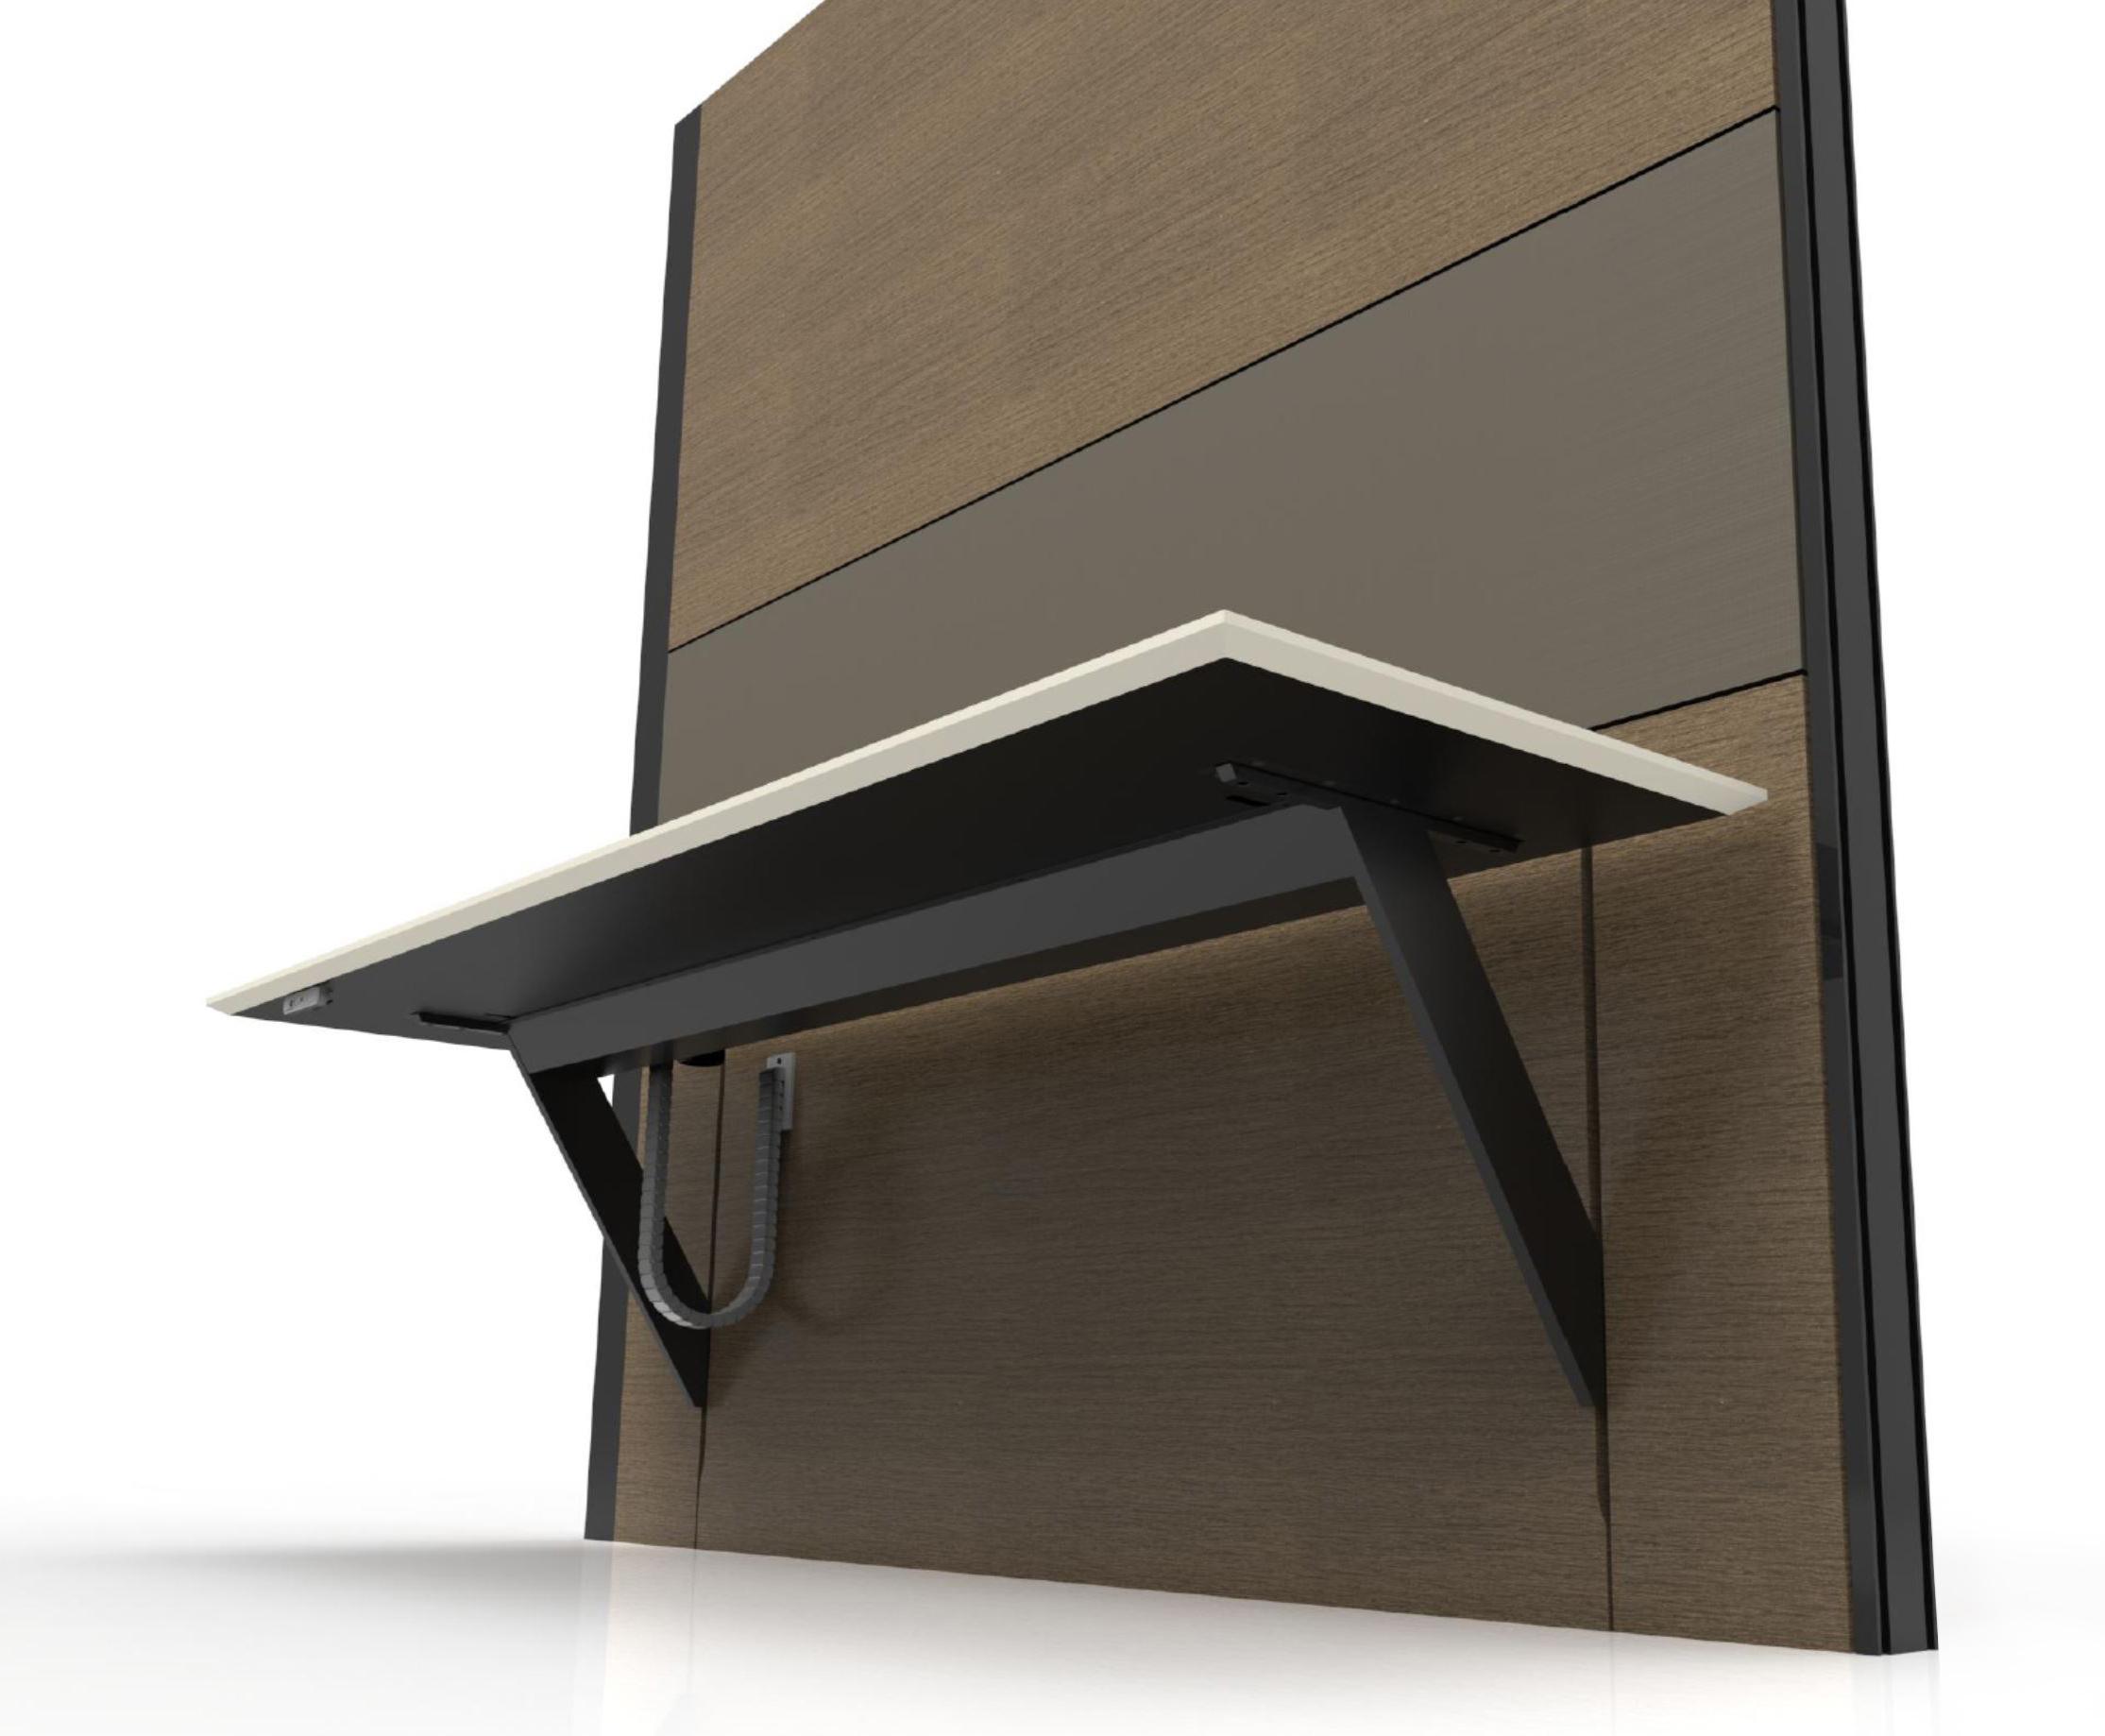 under desk rendering.JPG